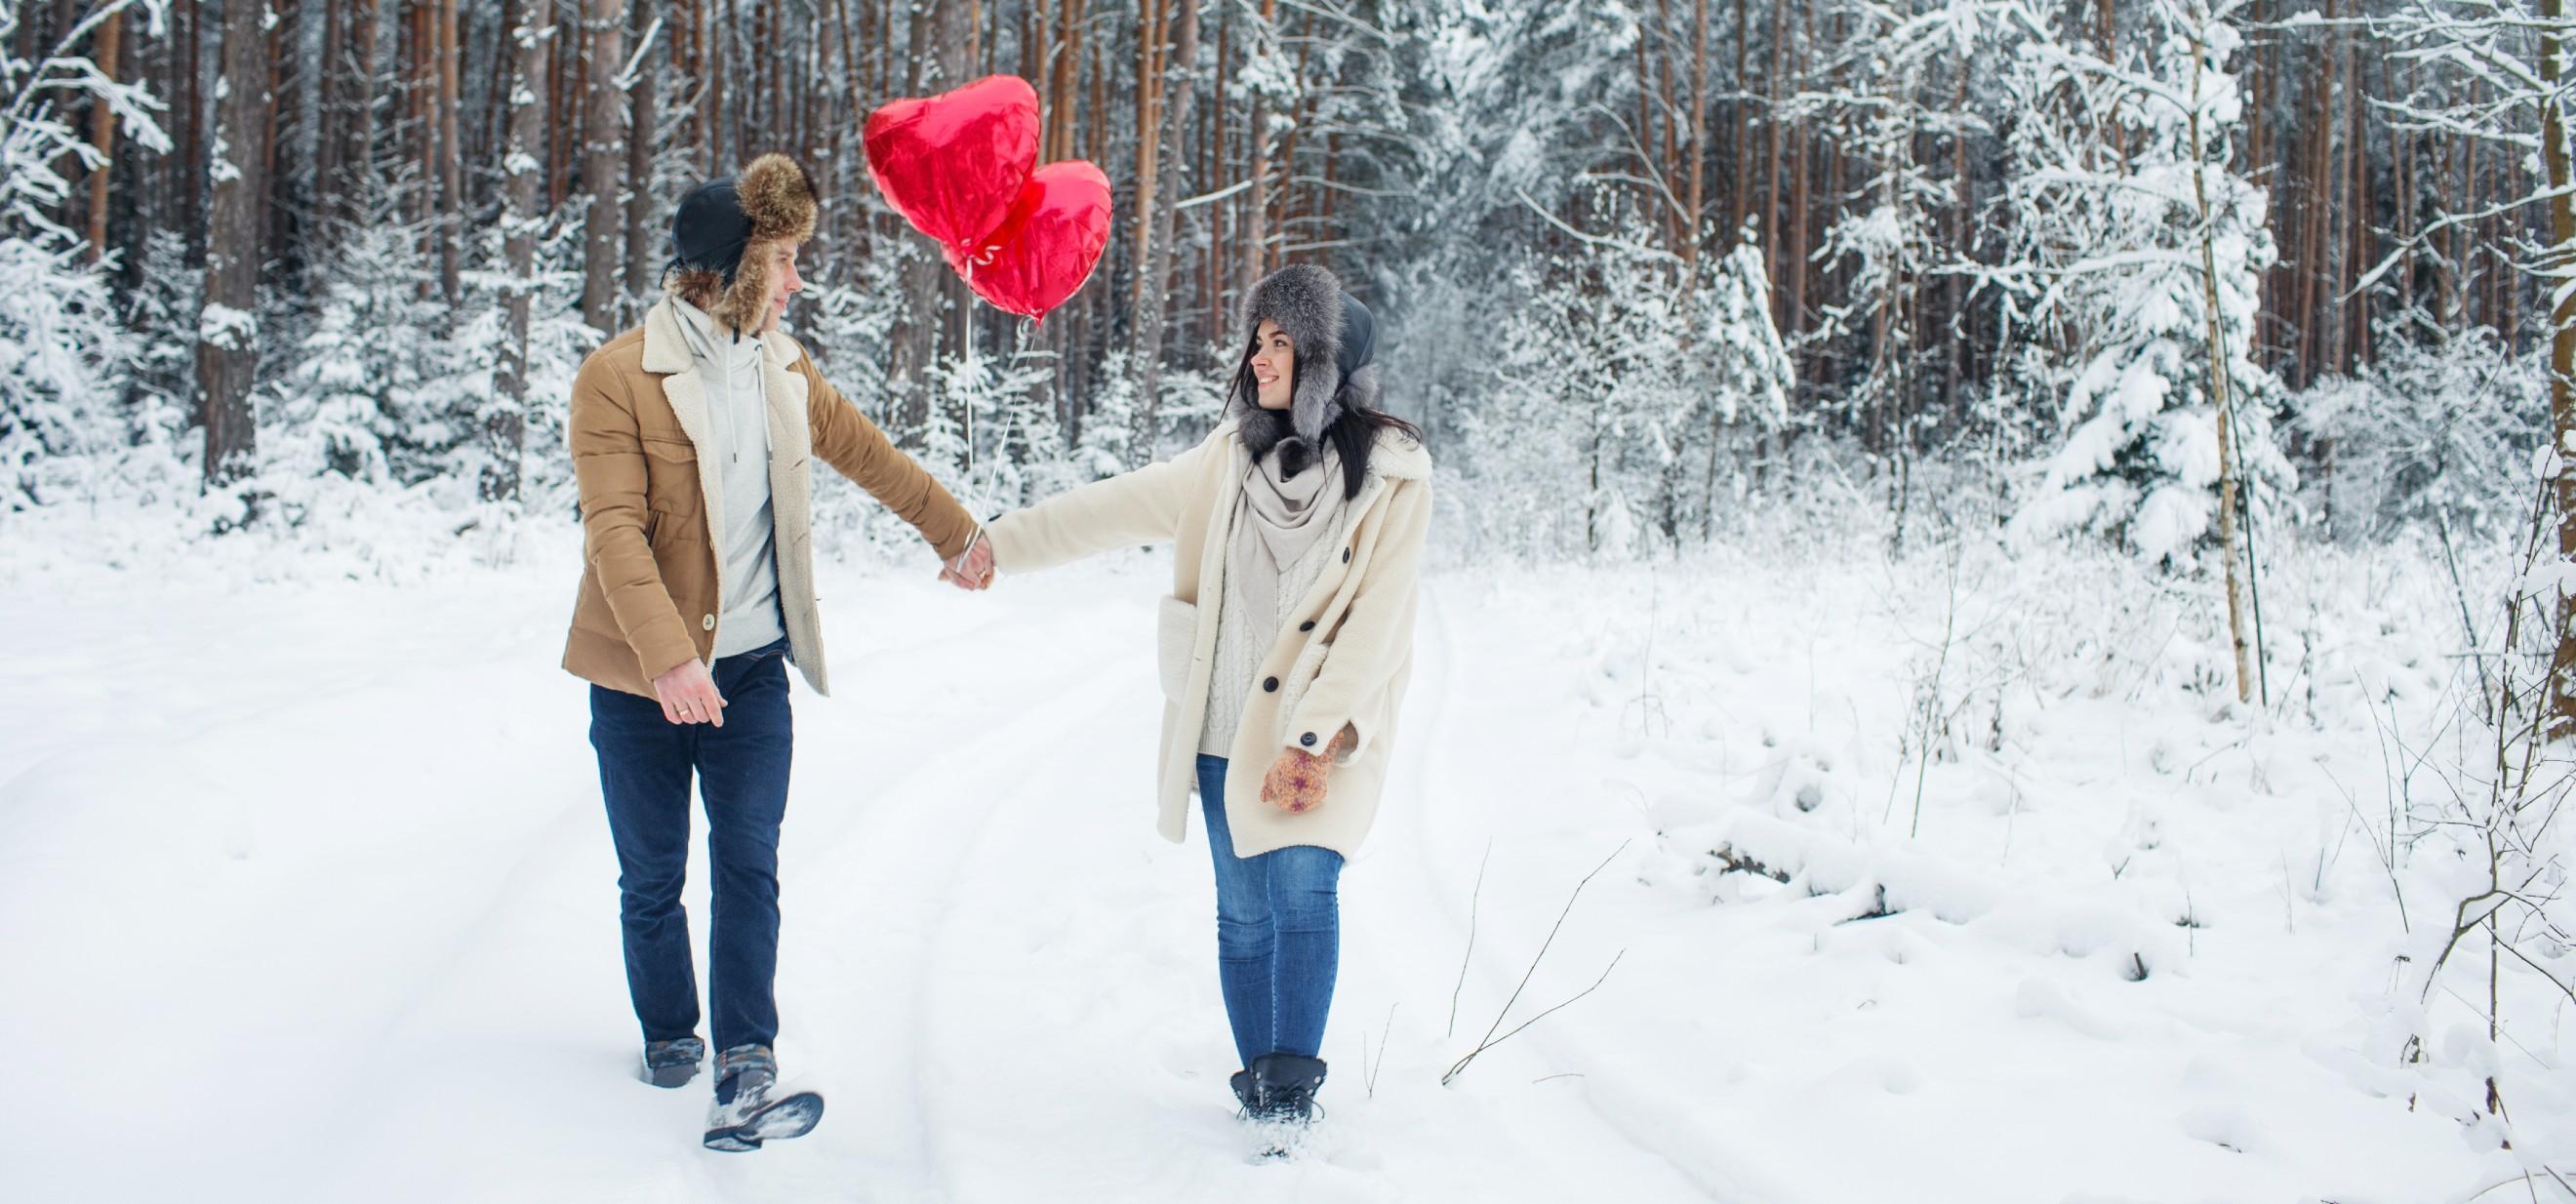 romantic couple strolling hand in hand in winter scene